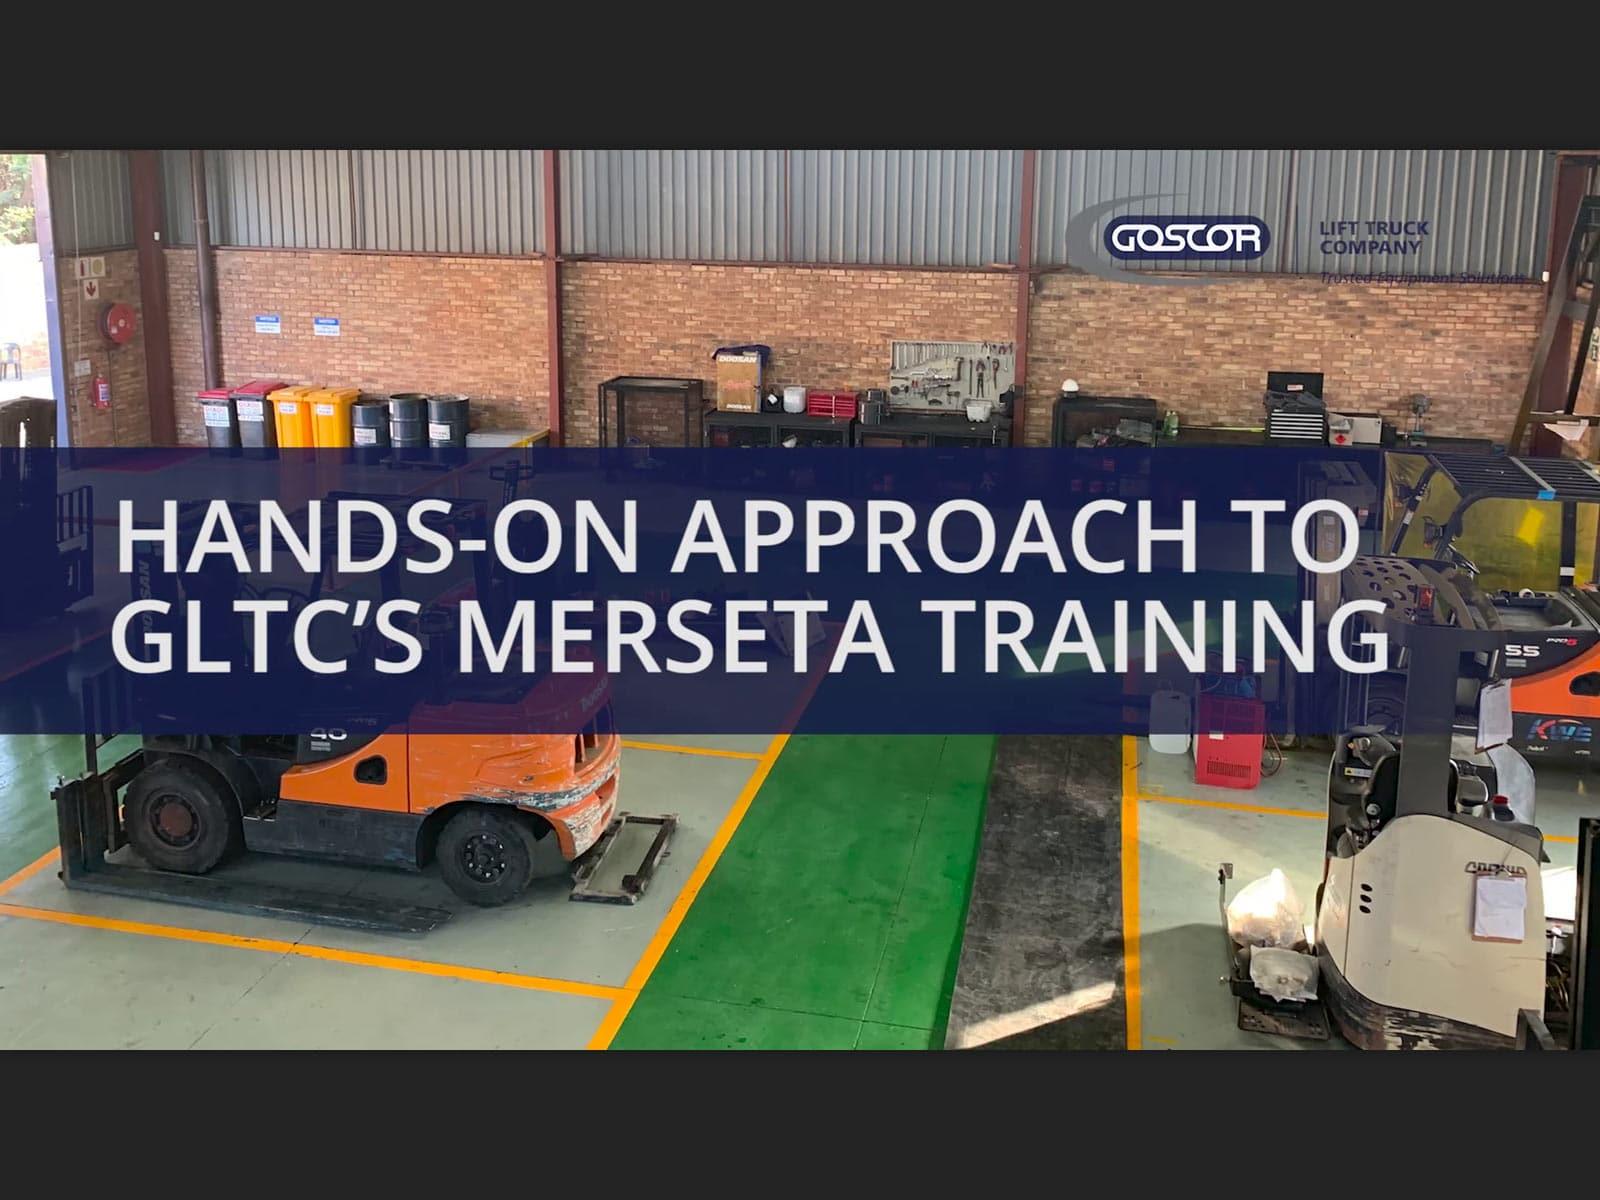 Goscor Lift Trucks Video Editing 1 - Goscor Lift Trucks – Video Editing Goscor Lift Trucks Video Editing 1 - Portfolio – Other design work